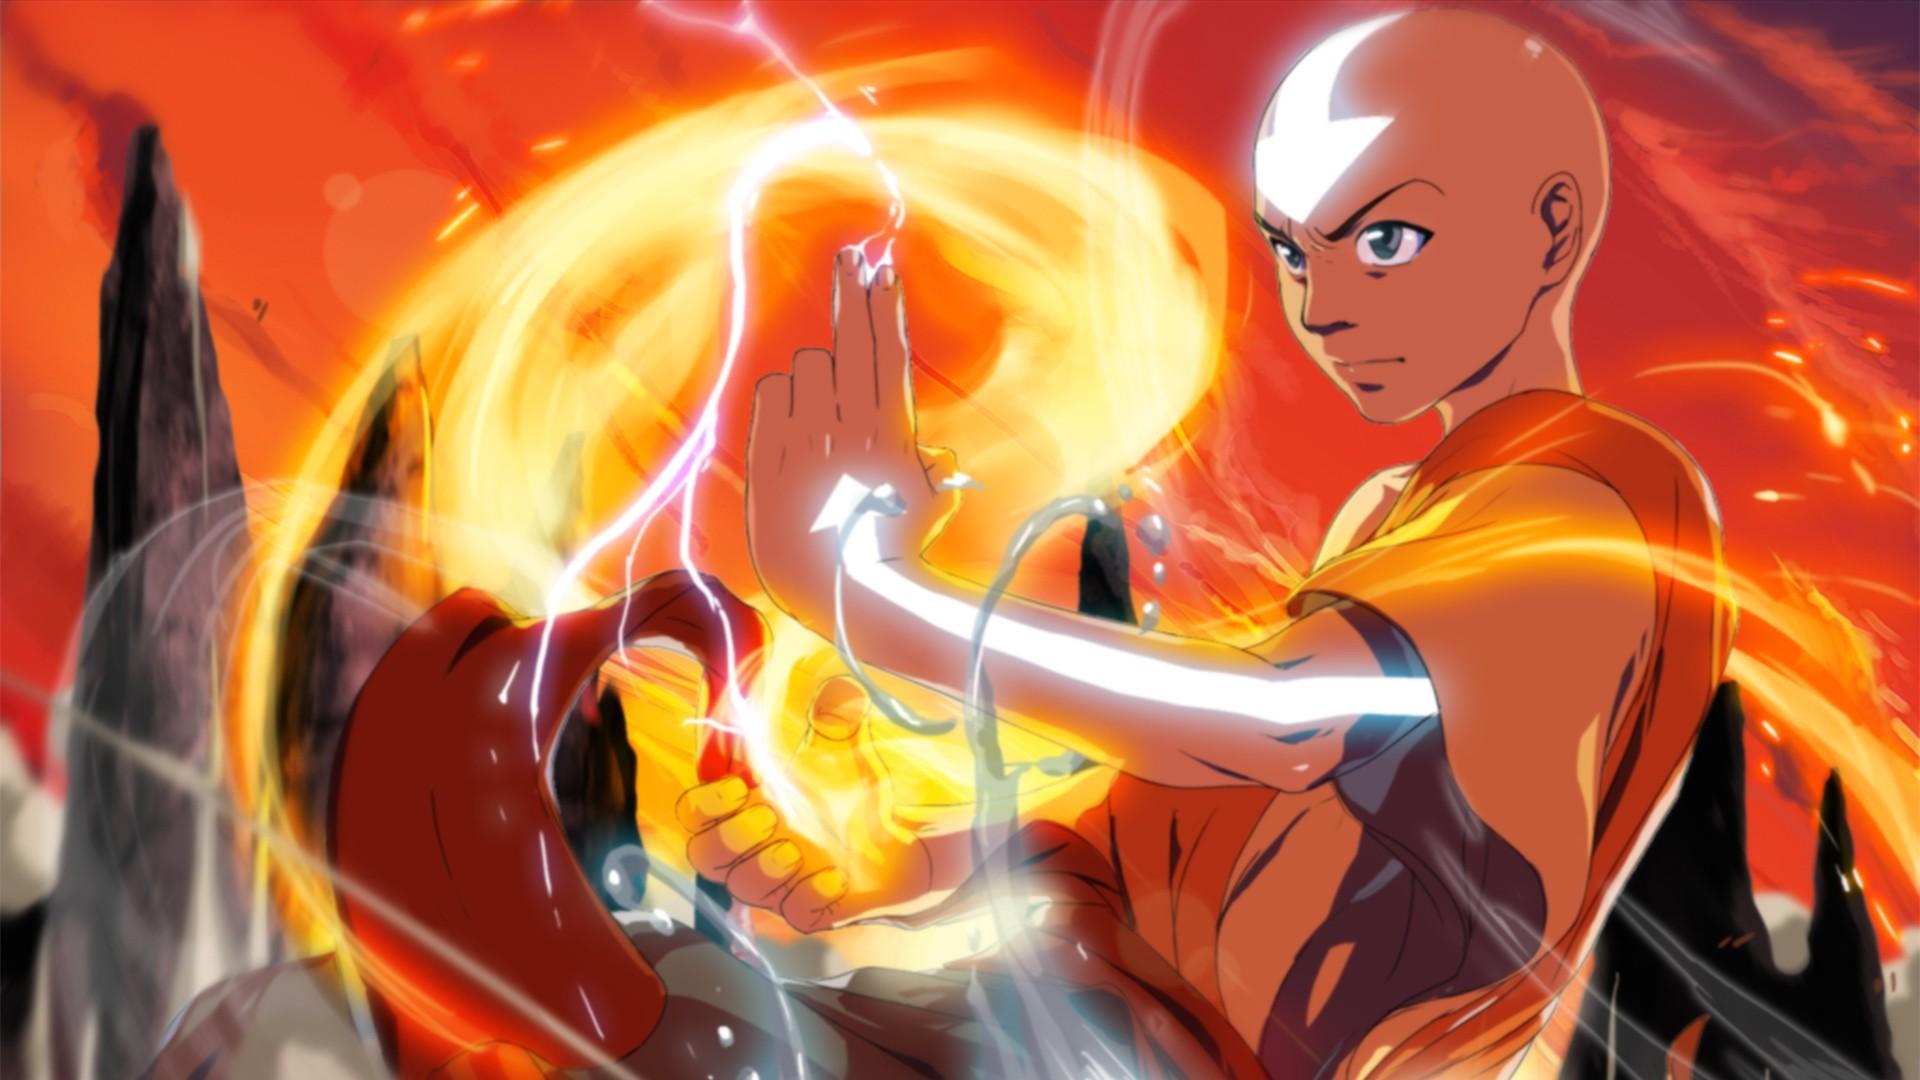 Illustration Anime Avatar The Last Airbender Aang Games Screenshot 1920x1080 Px Computer Wallpaper